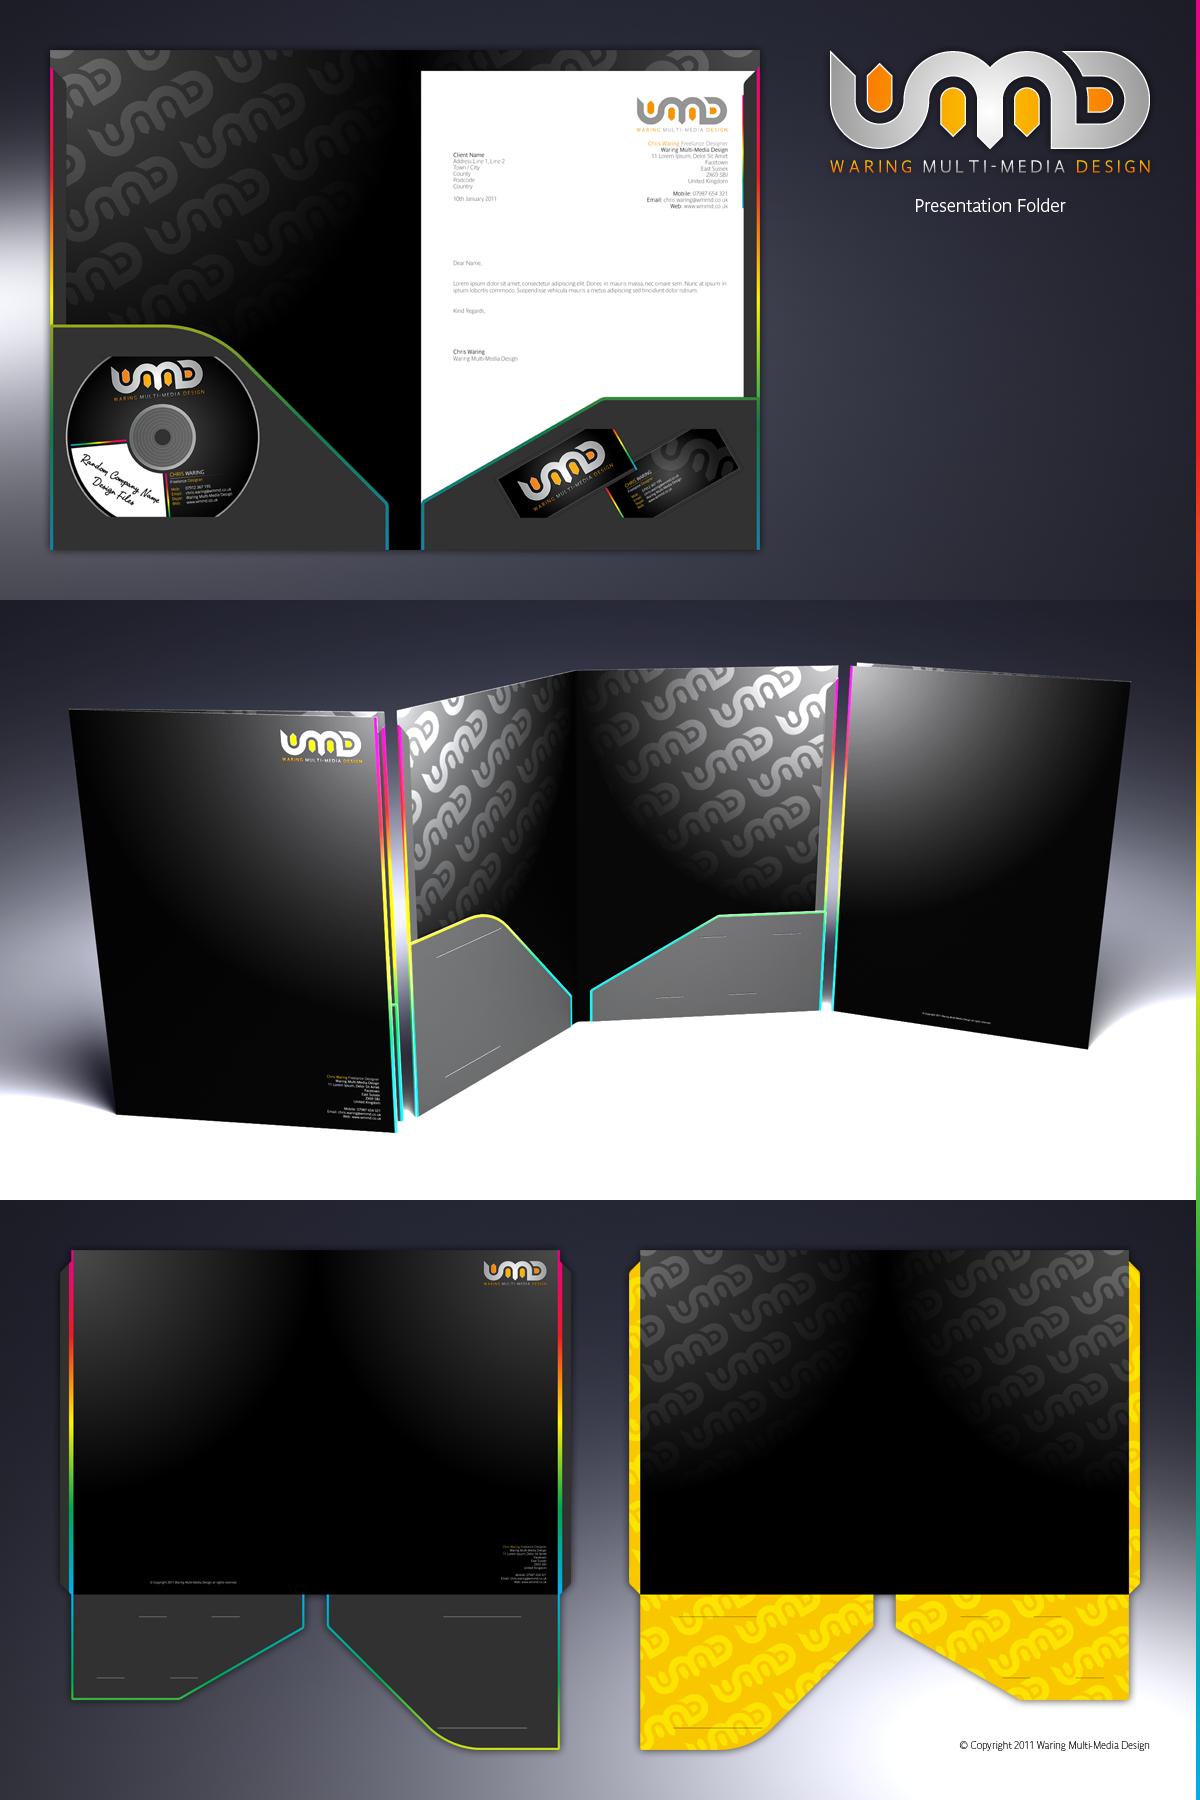 WMMD: Presentation Folder